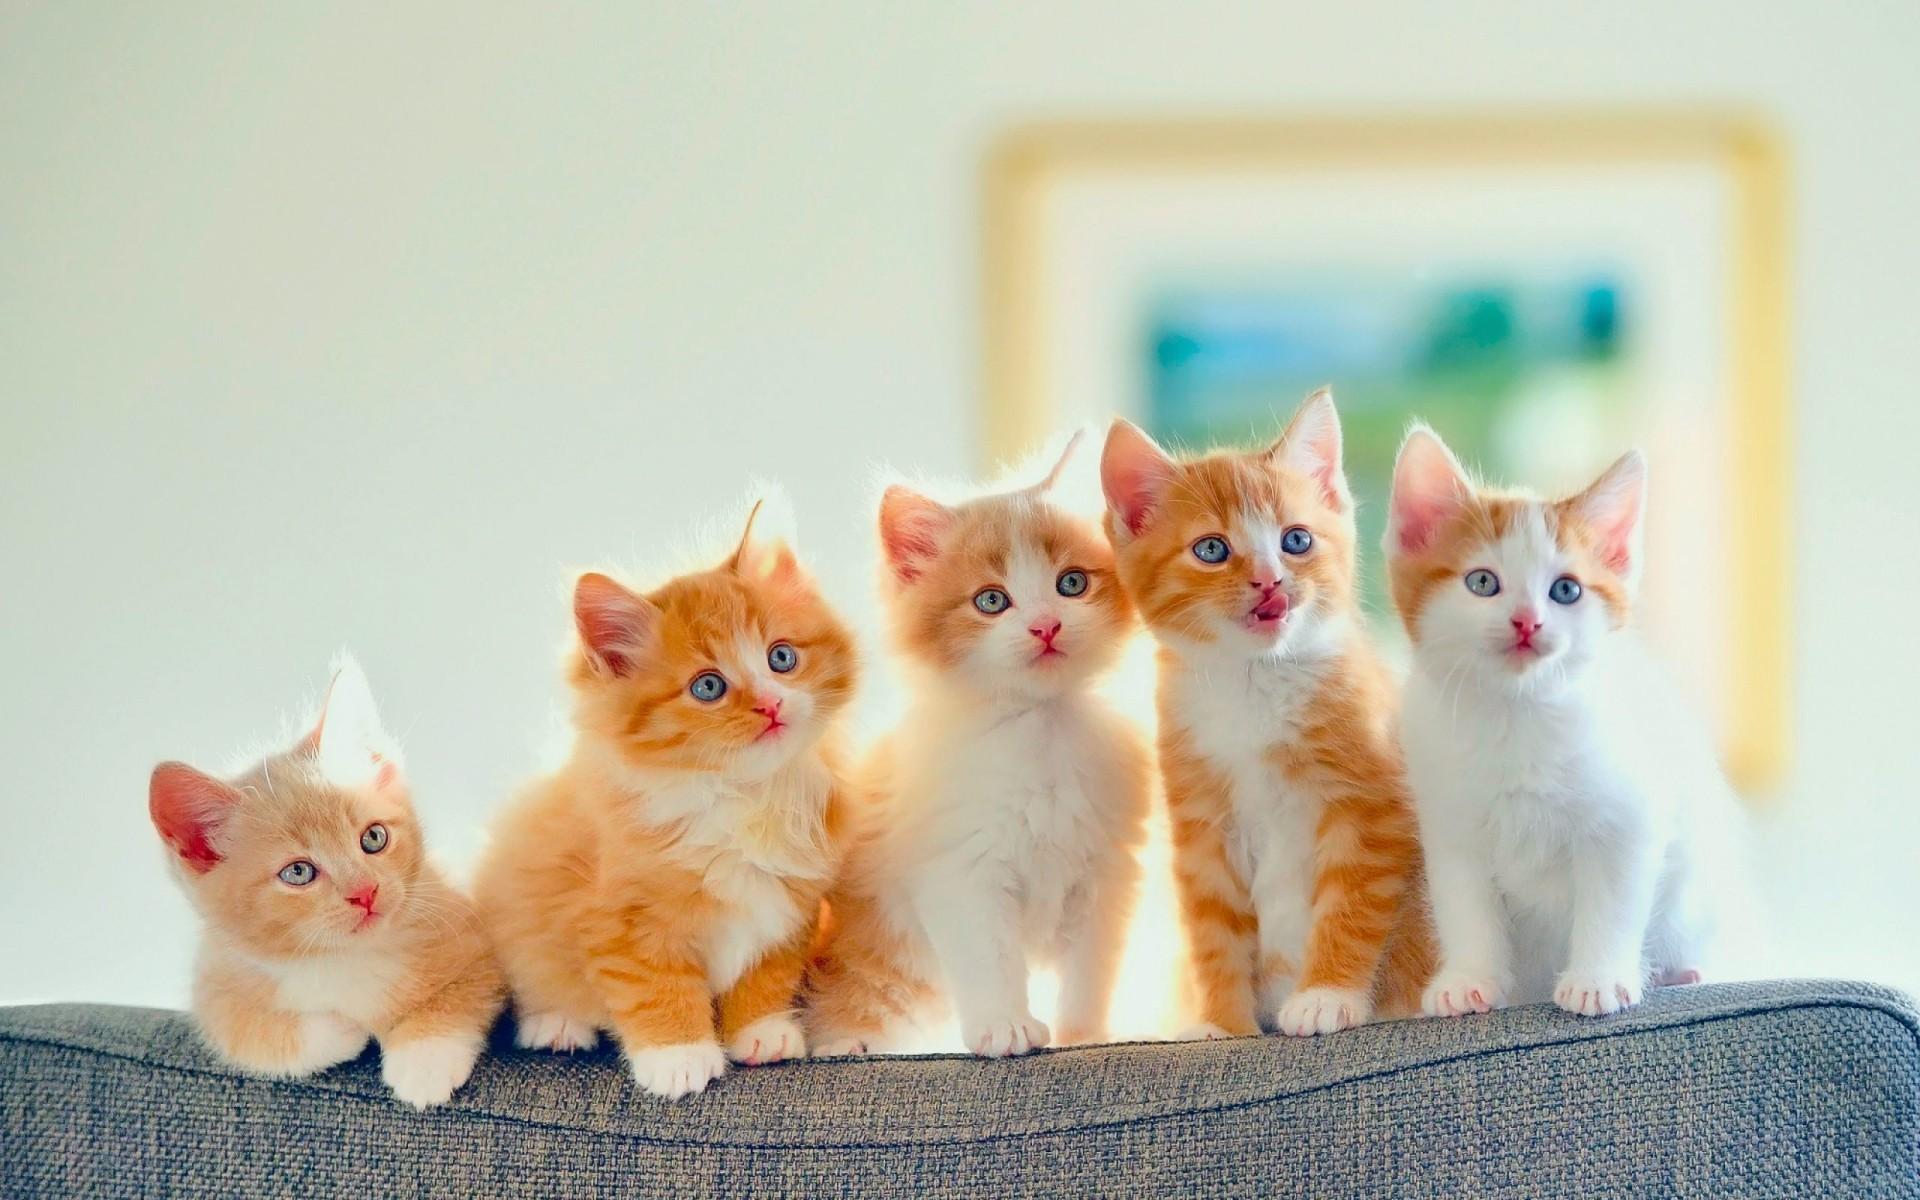 1920x1080 Fluffy Kitten Wallpapers Hd